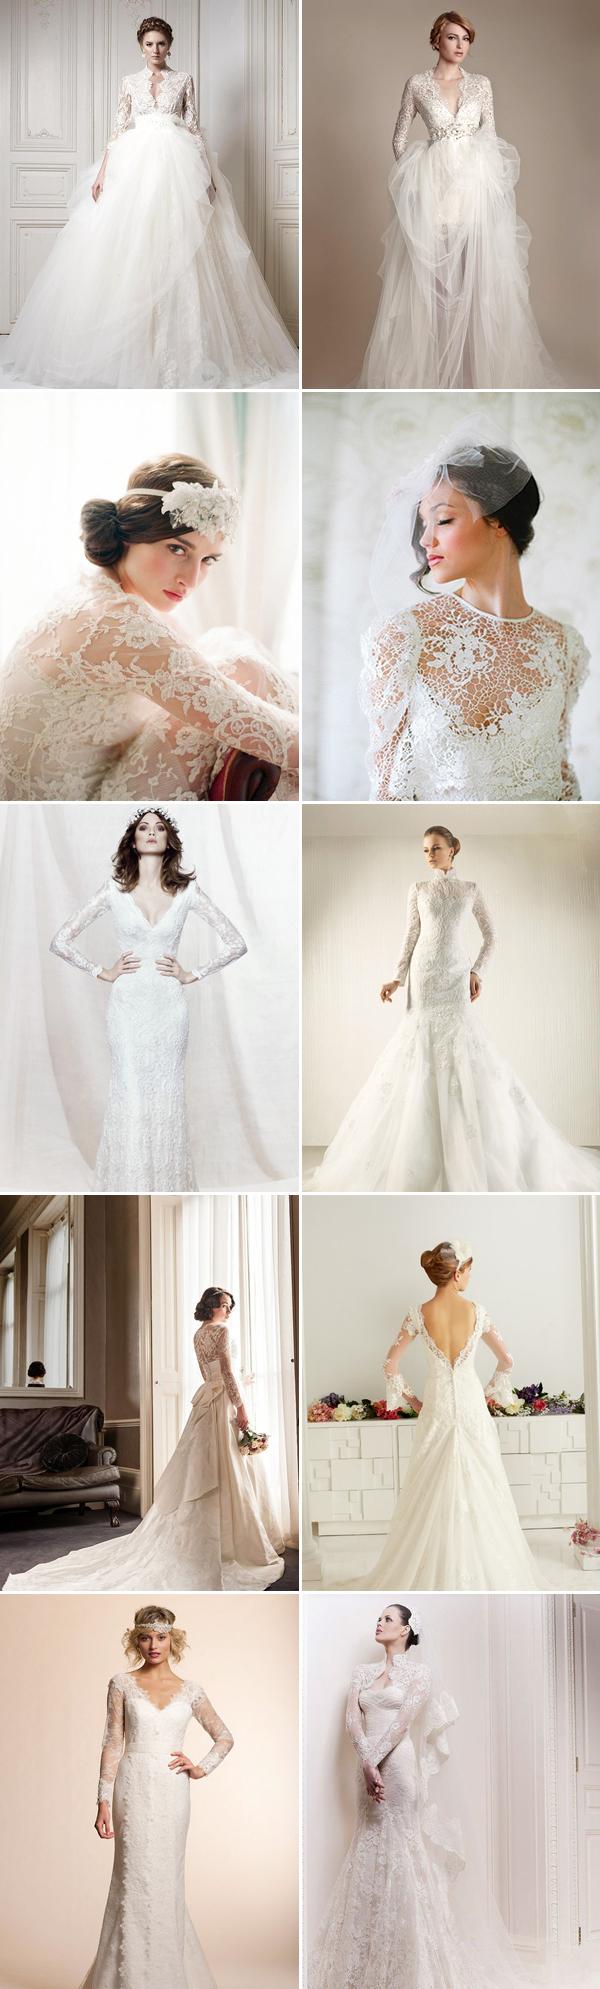 02_long sleeve wedding dresses